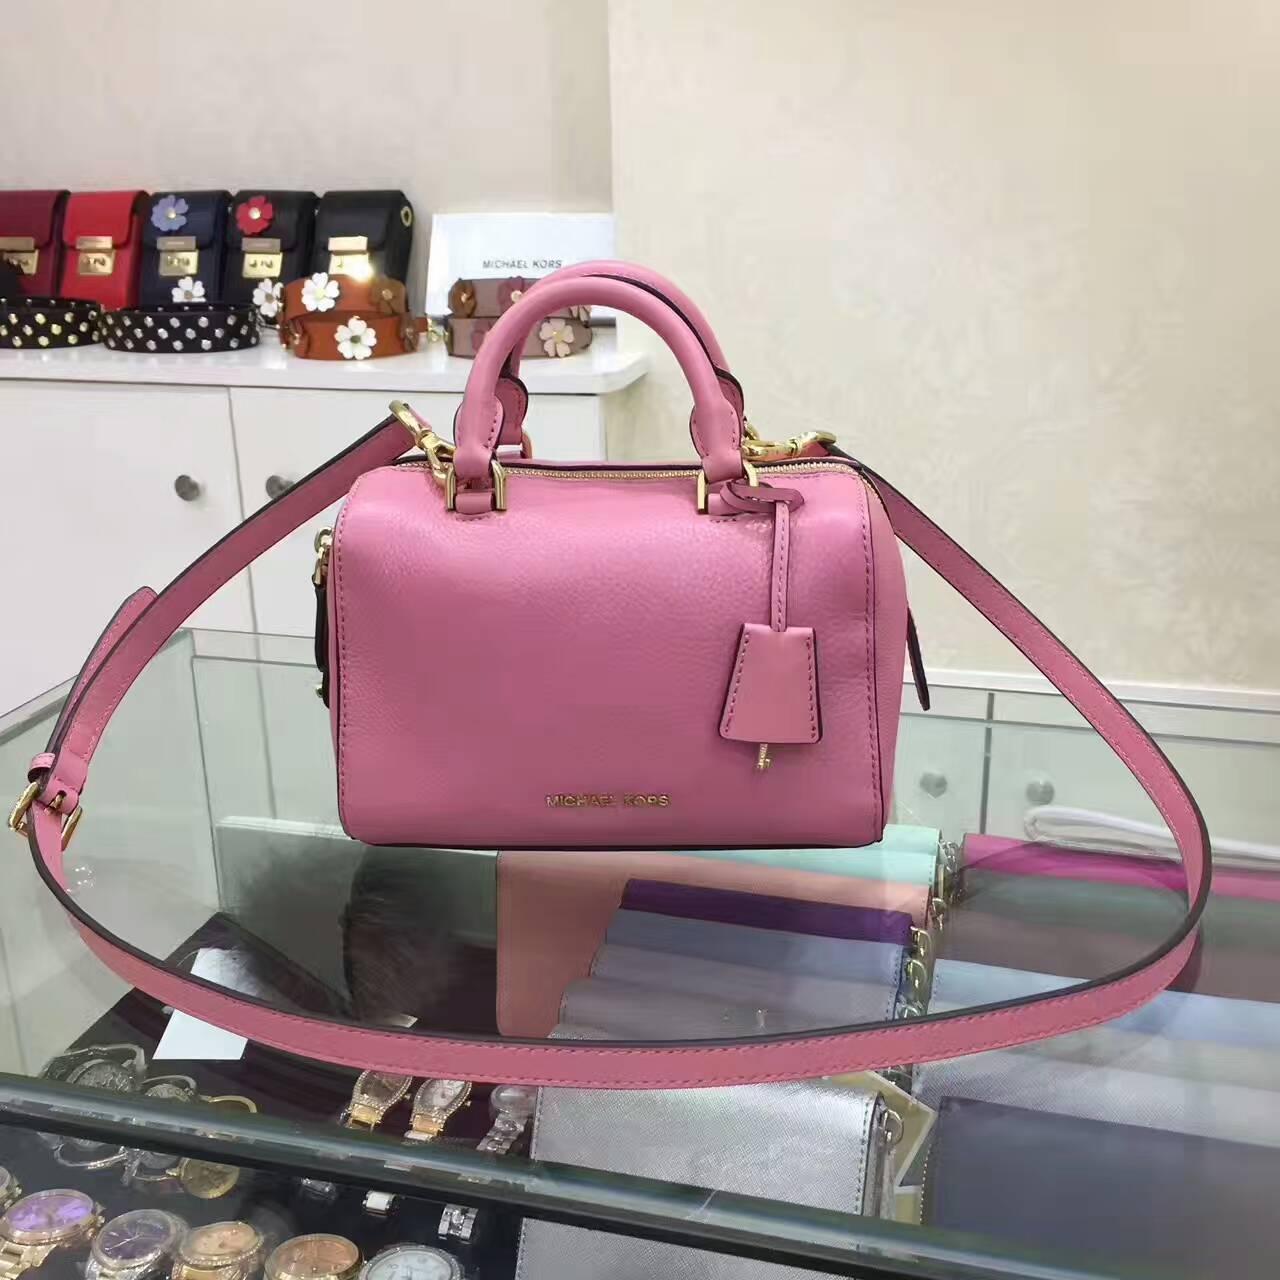 OUTLET美國代購 Michael Kors MK 波士頓皮鎖頭枕頭包 手提包 肩背包 斜背包 粉色